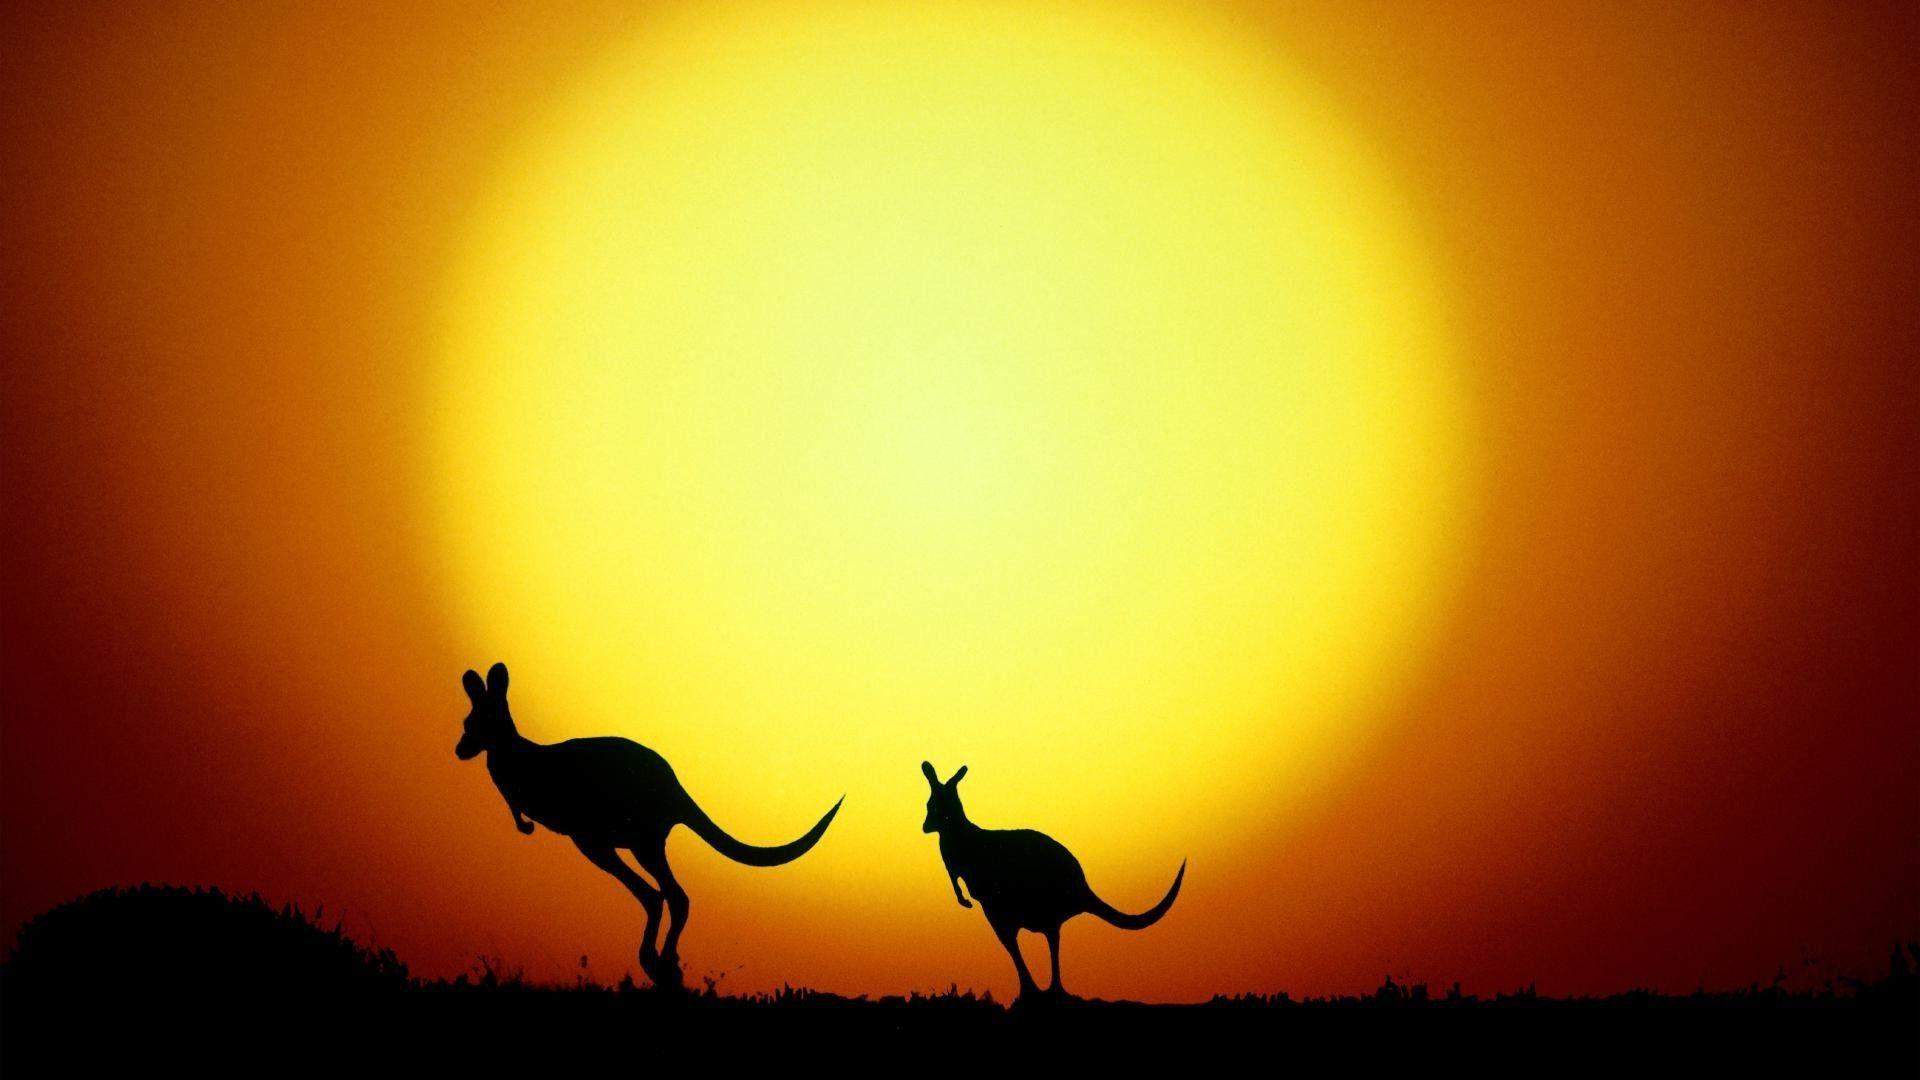 Kangaroo Wallpapers And Backgrounds